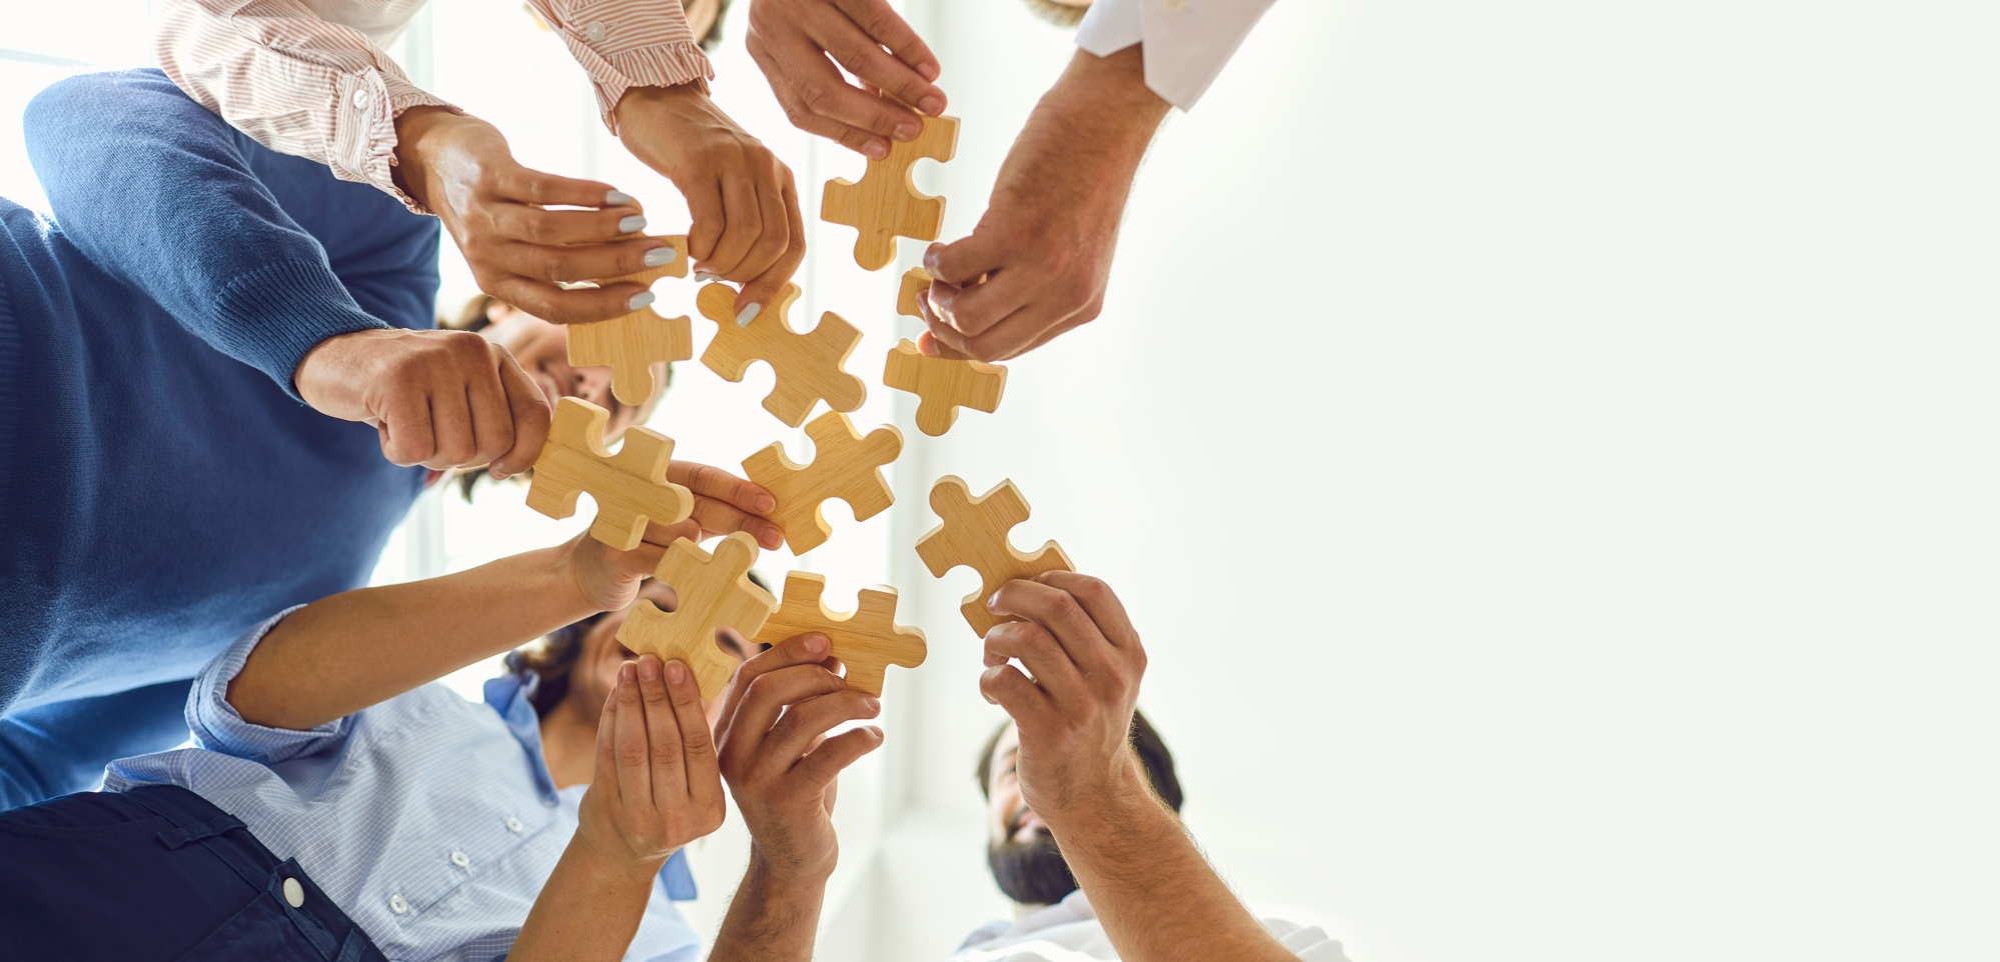 Davaco Multi-Site Let's Talk Puzzle Pieces